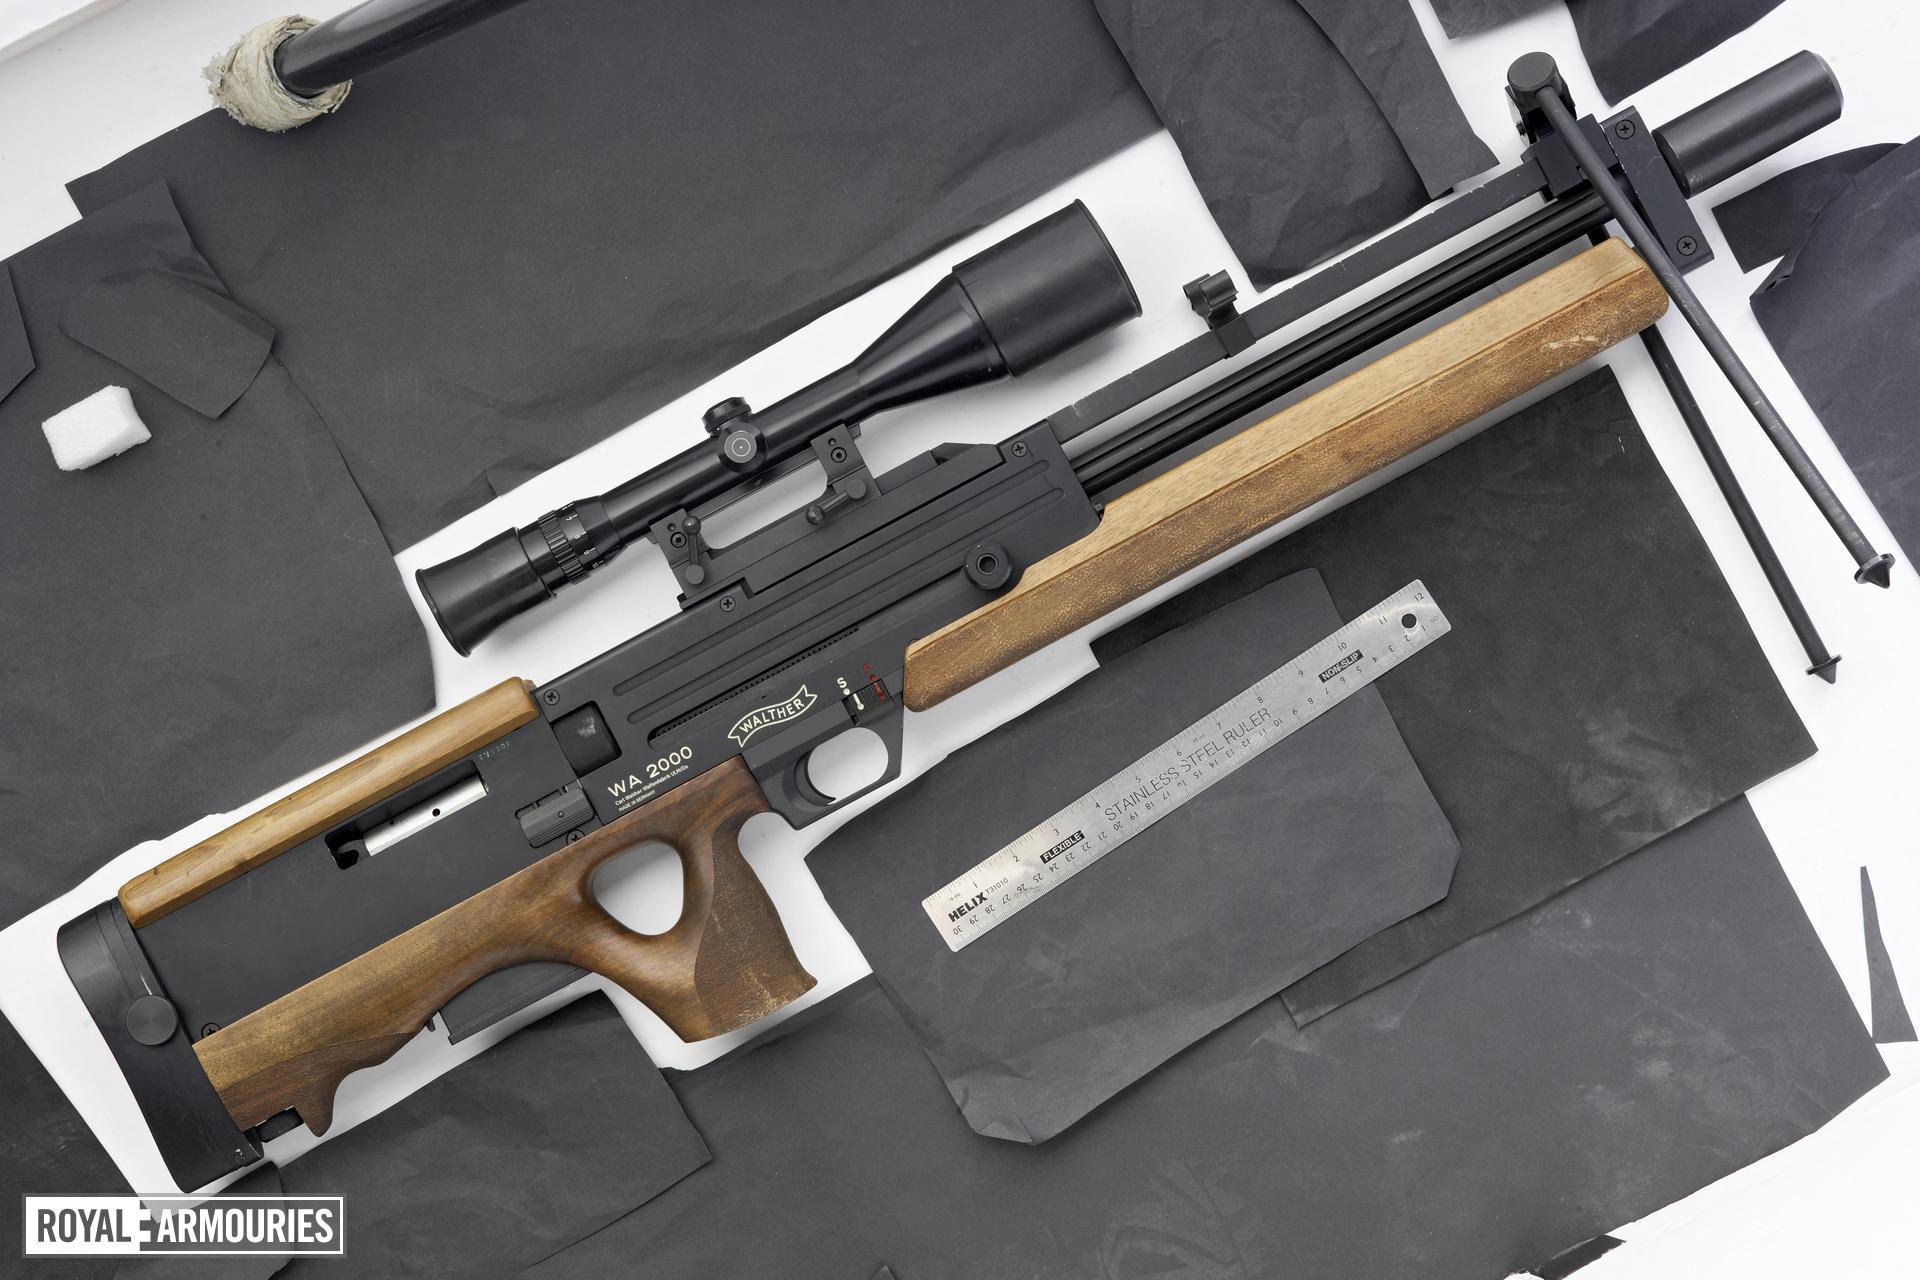 Centrefire self-loading sniper rifle - Walther WA2000